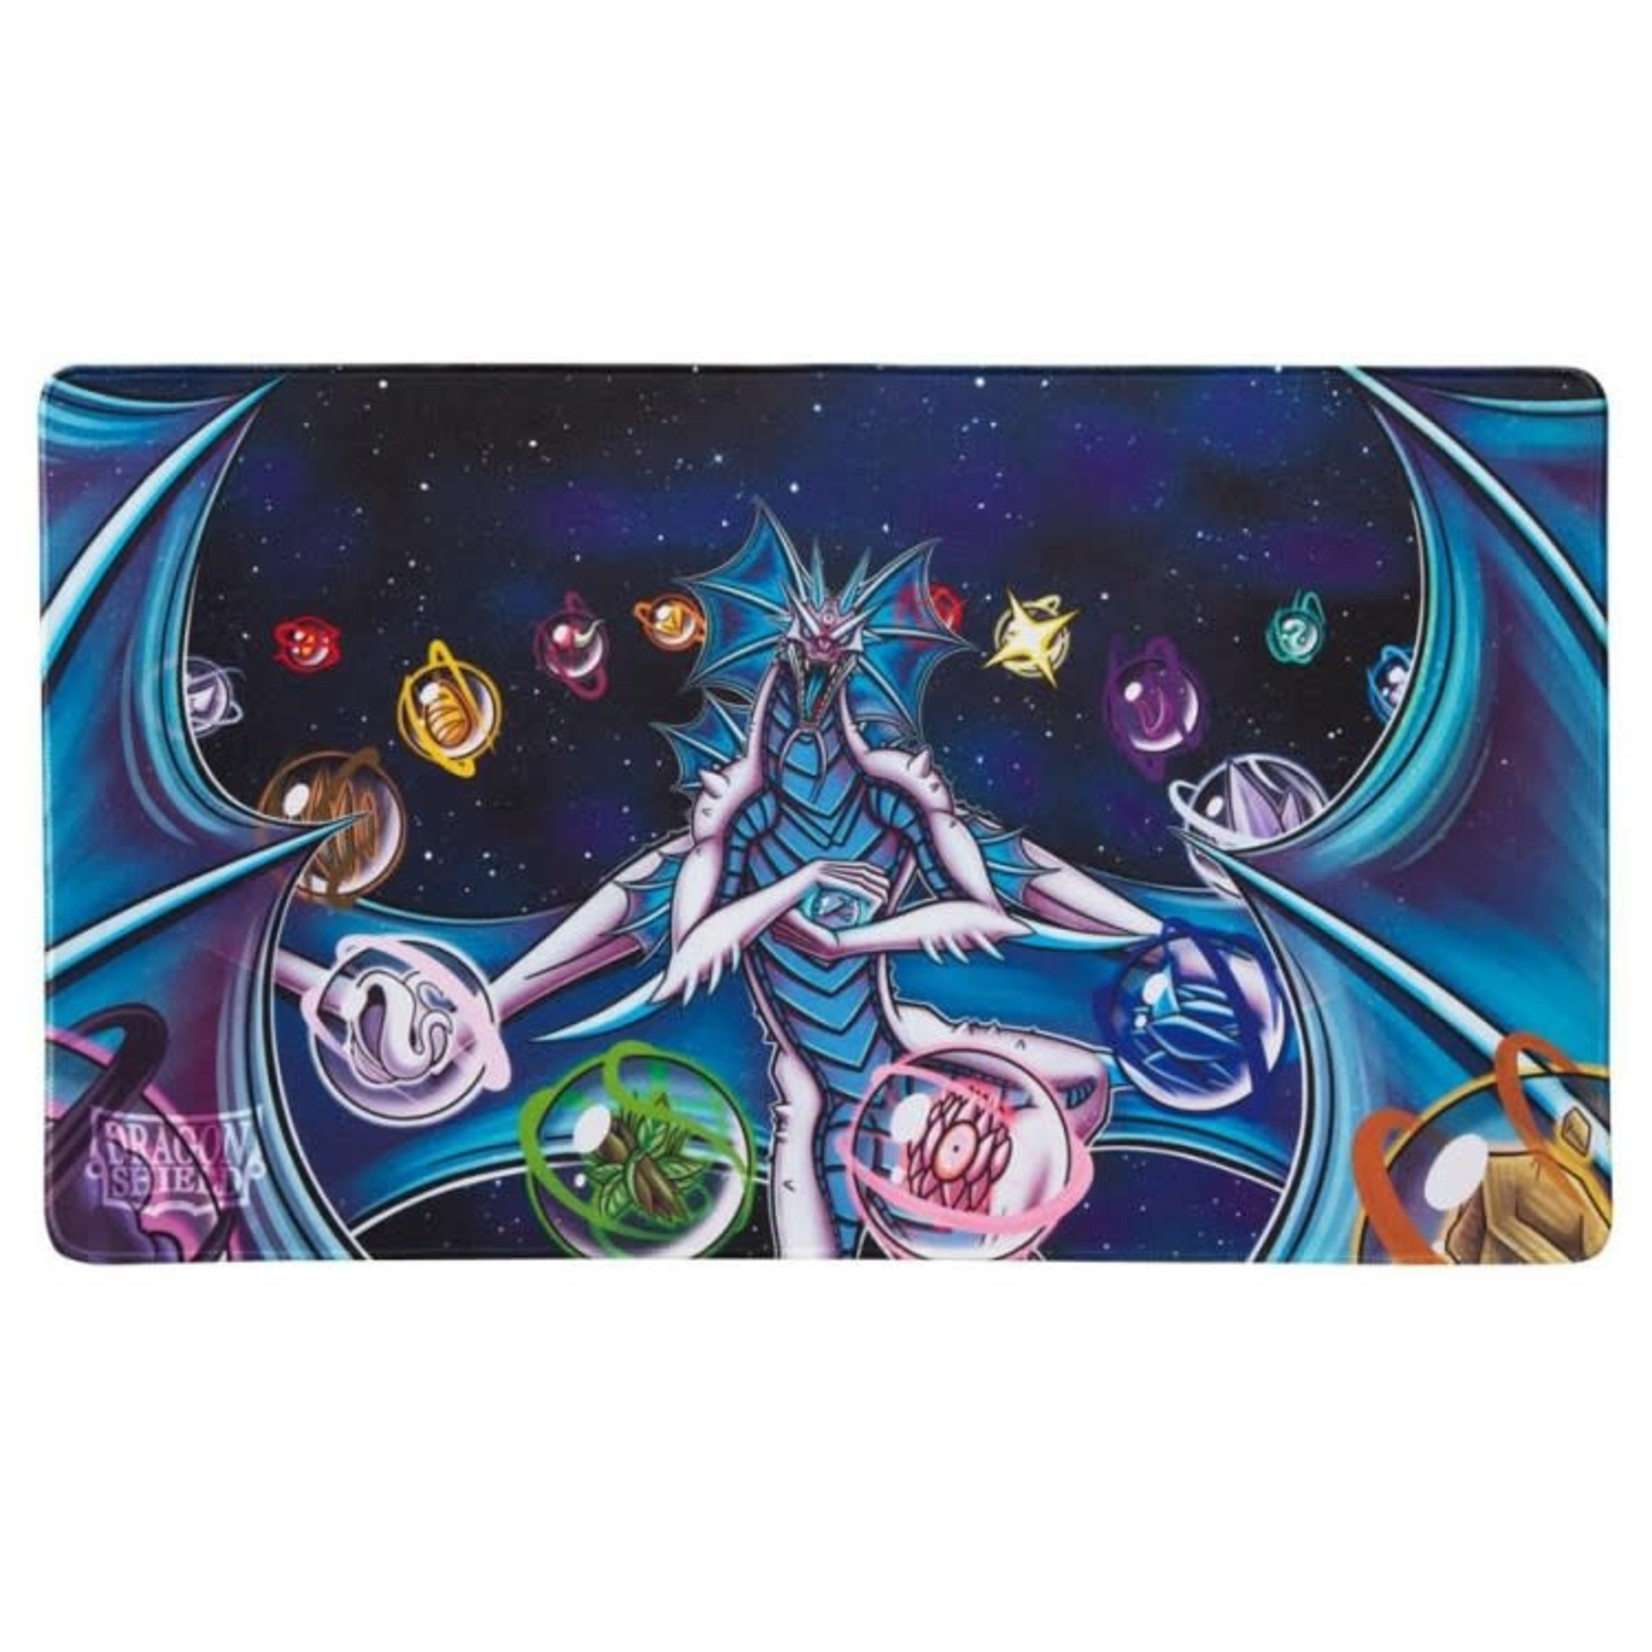 Arcane Tinman Dragon Shield Playmat: Art - Gilead